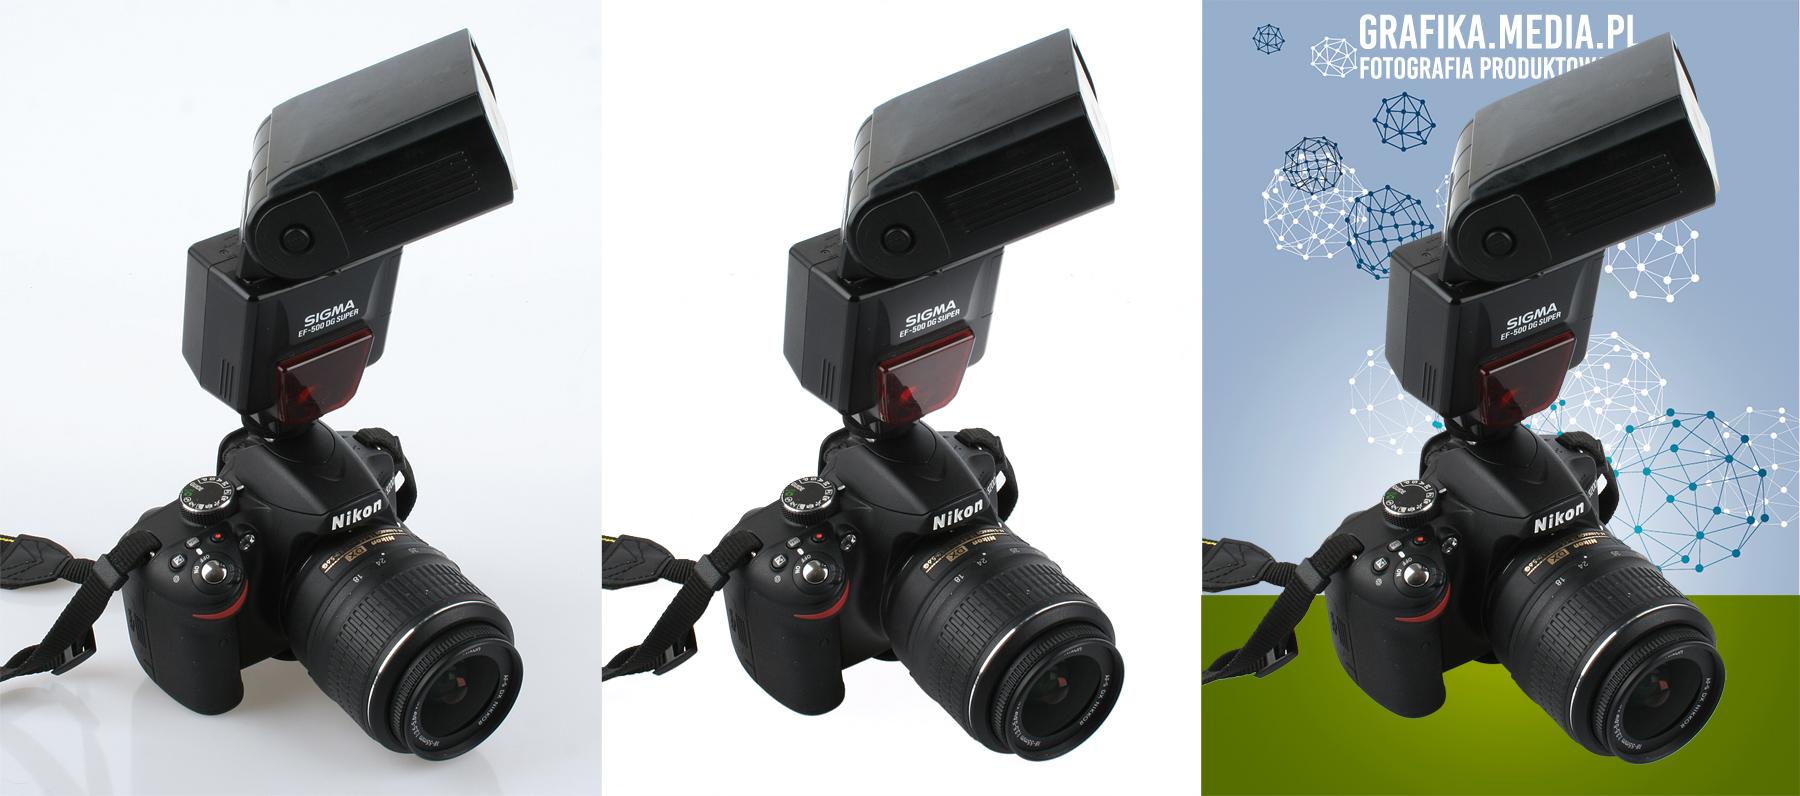 nikon-fotografia-produktowa